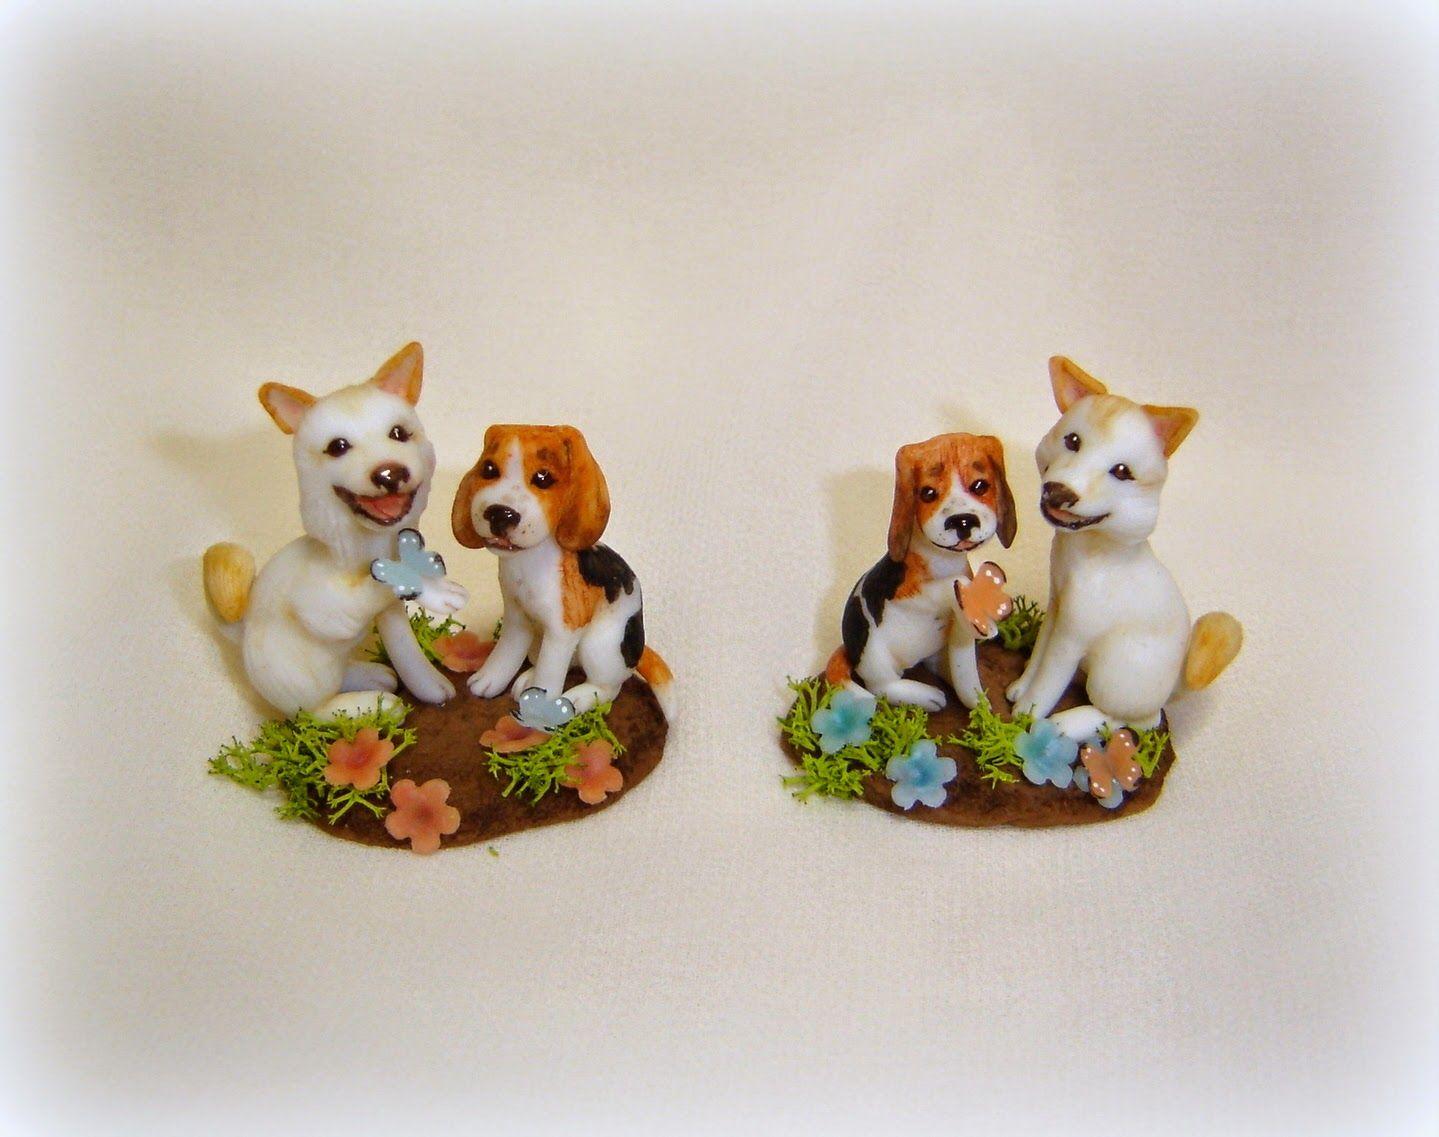 La Bottega delle Fate: Friendship - little dogs on commission